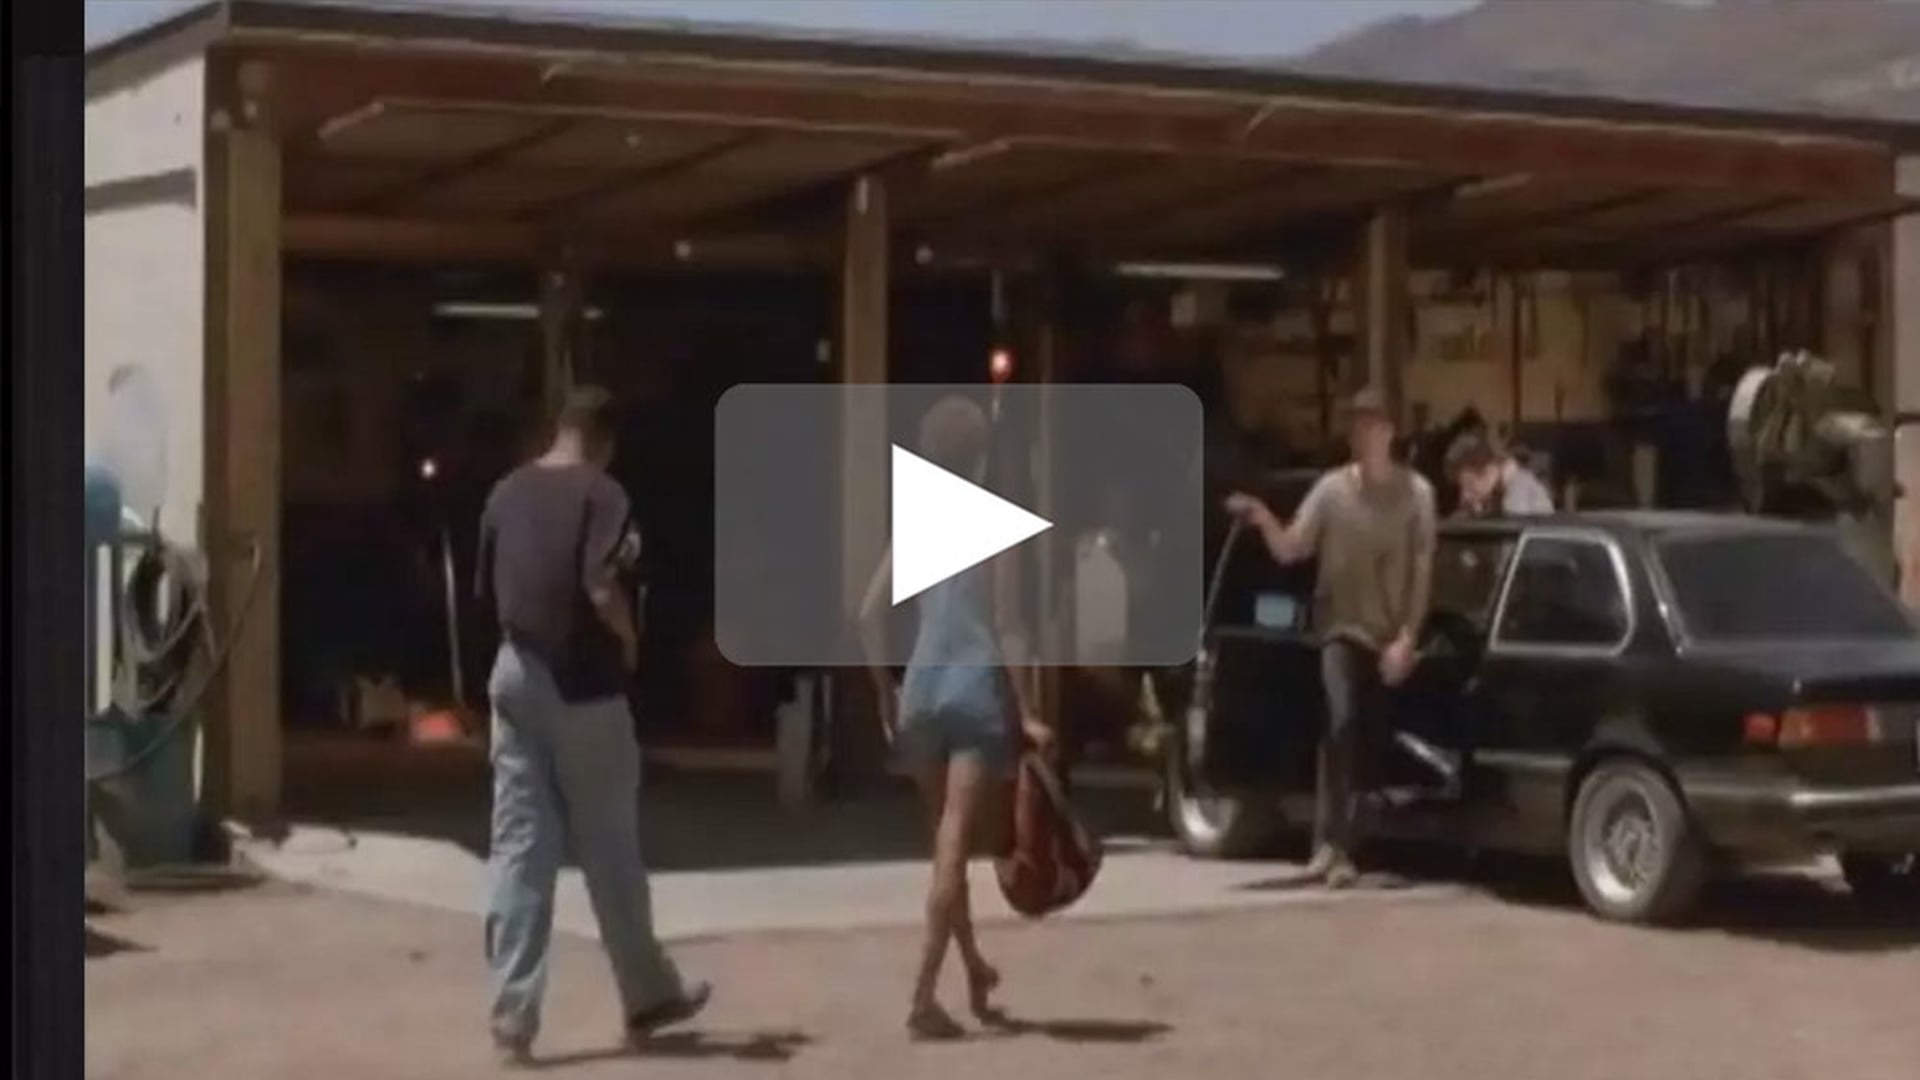 Spark [1998, narrative feature]